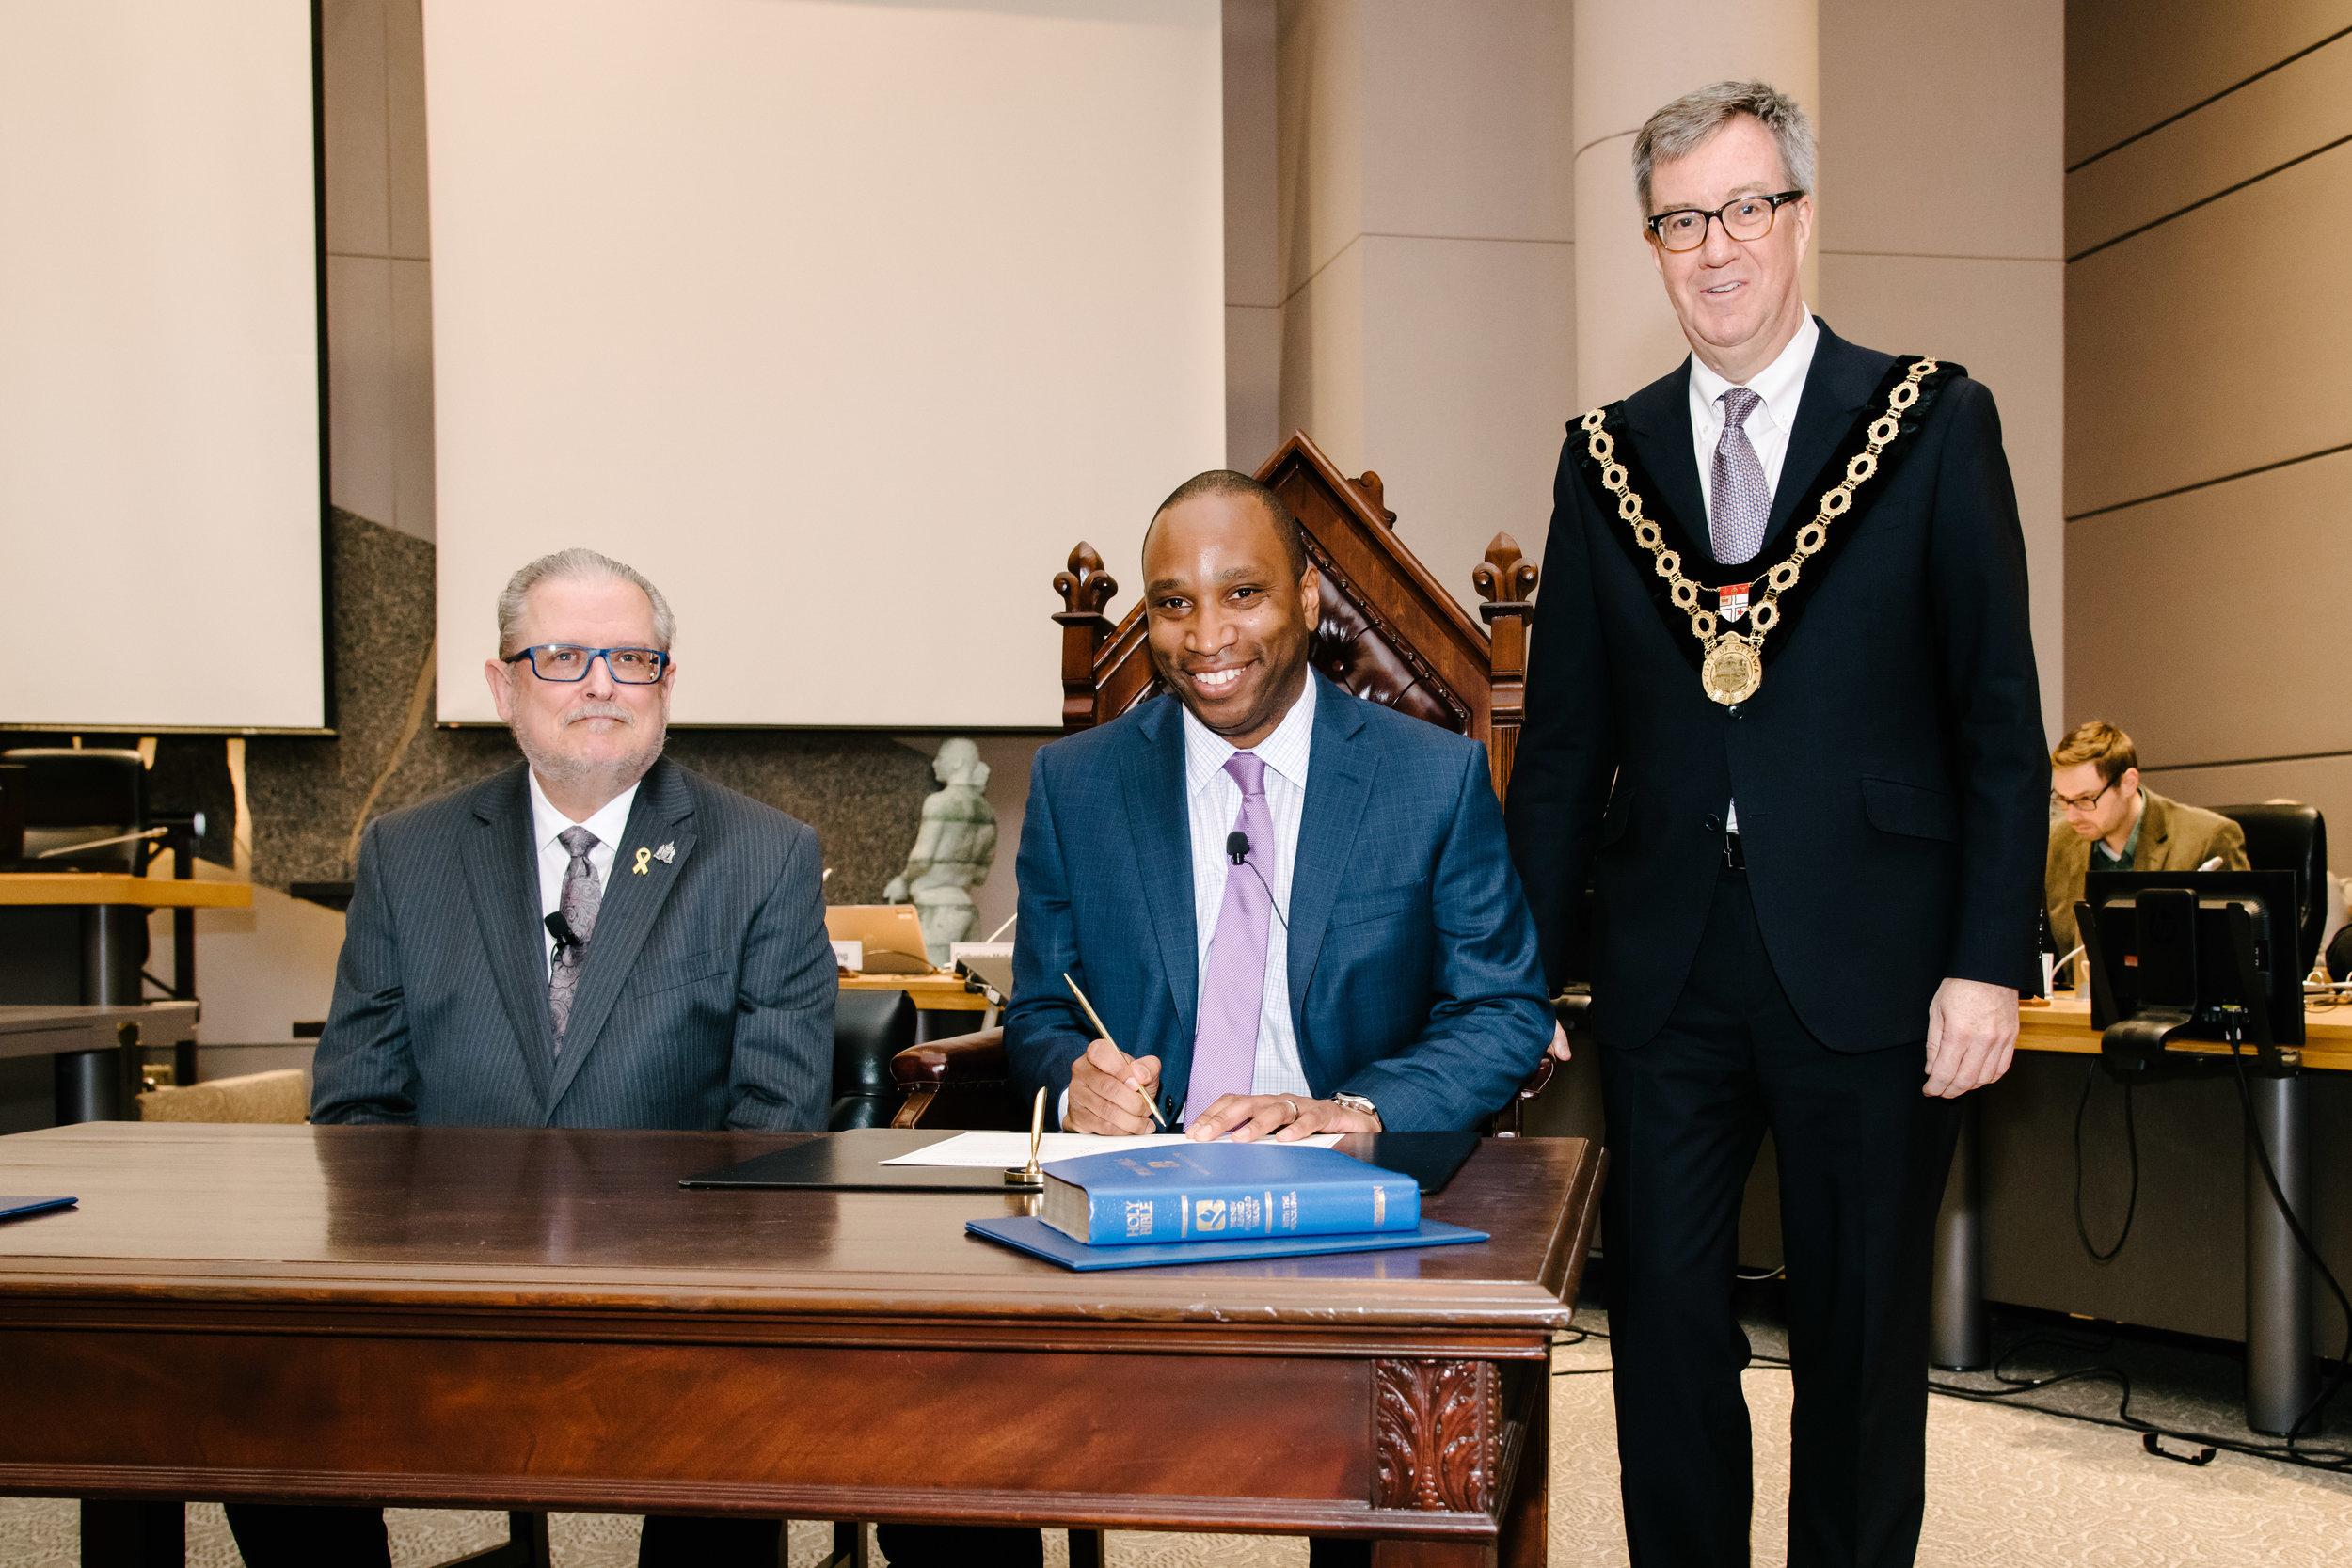 Ottawa's first Black councillor Rawlson King